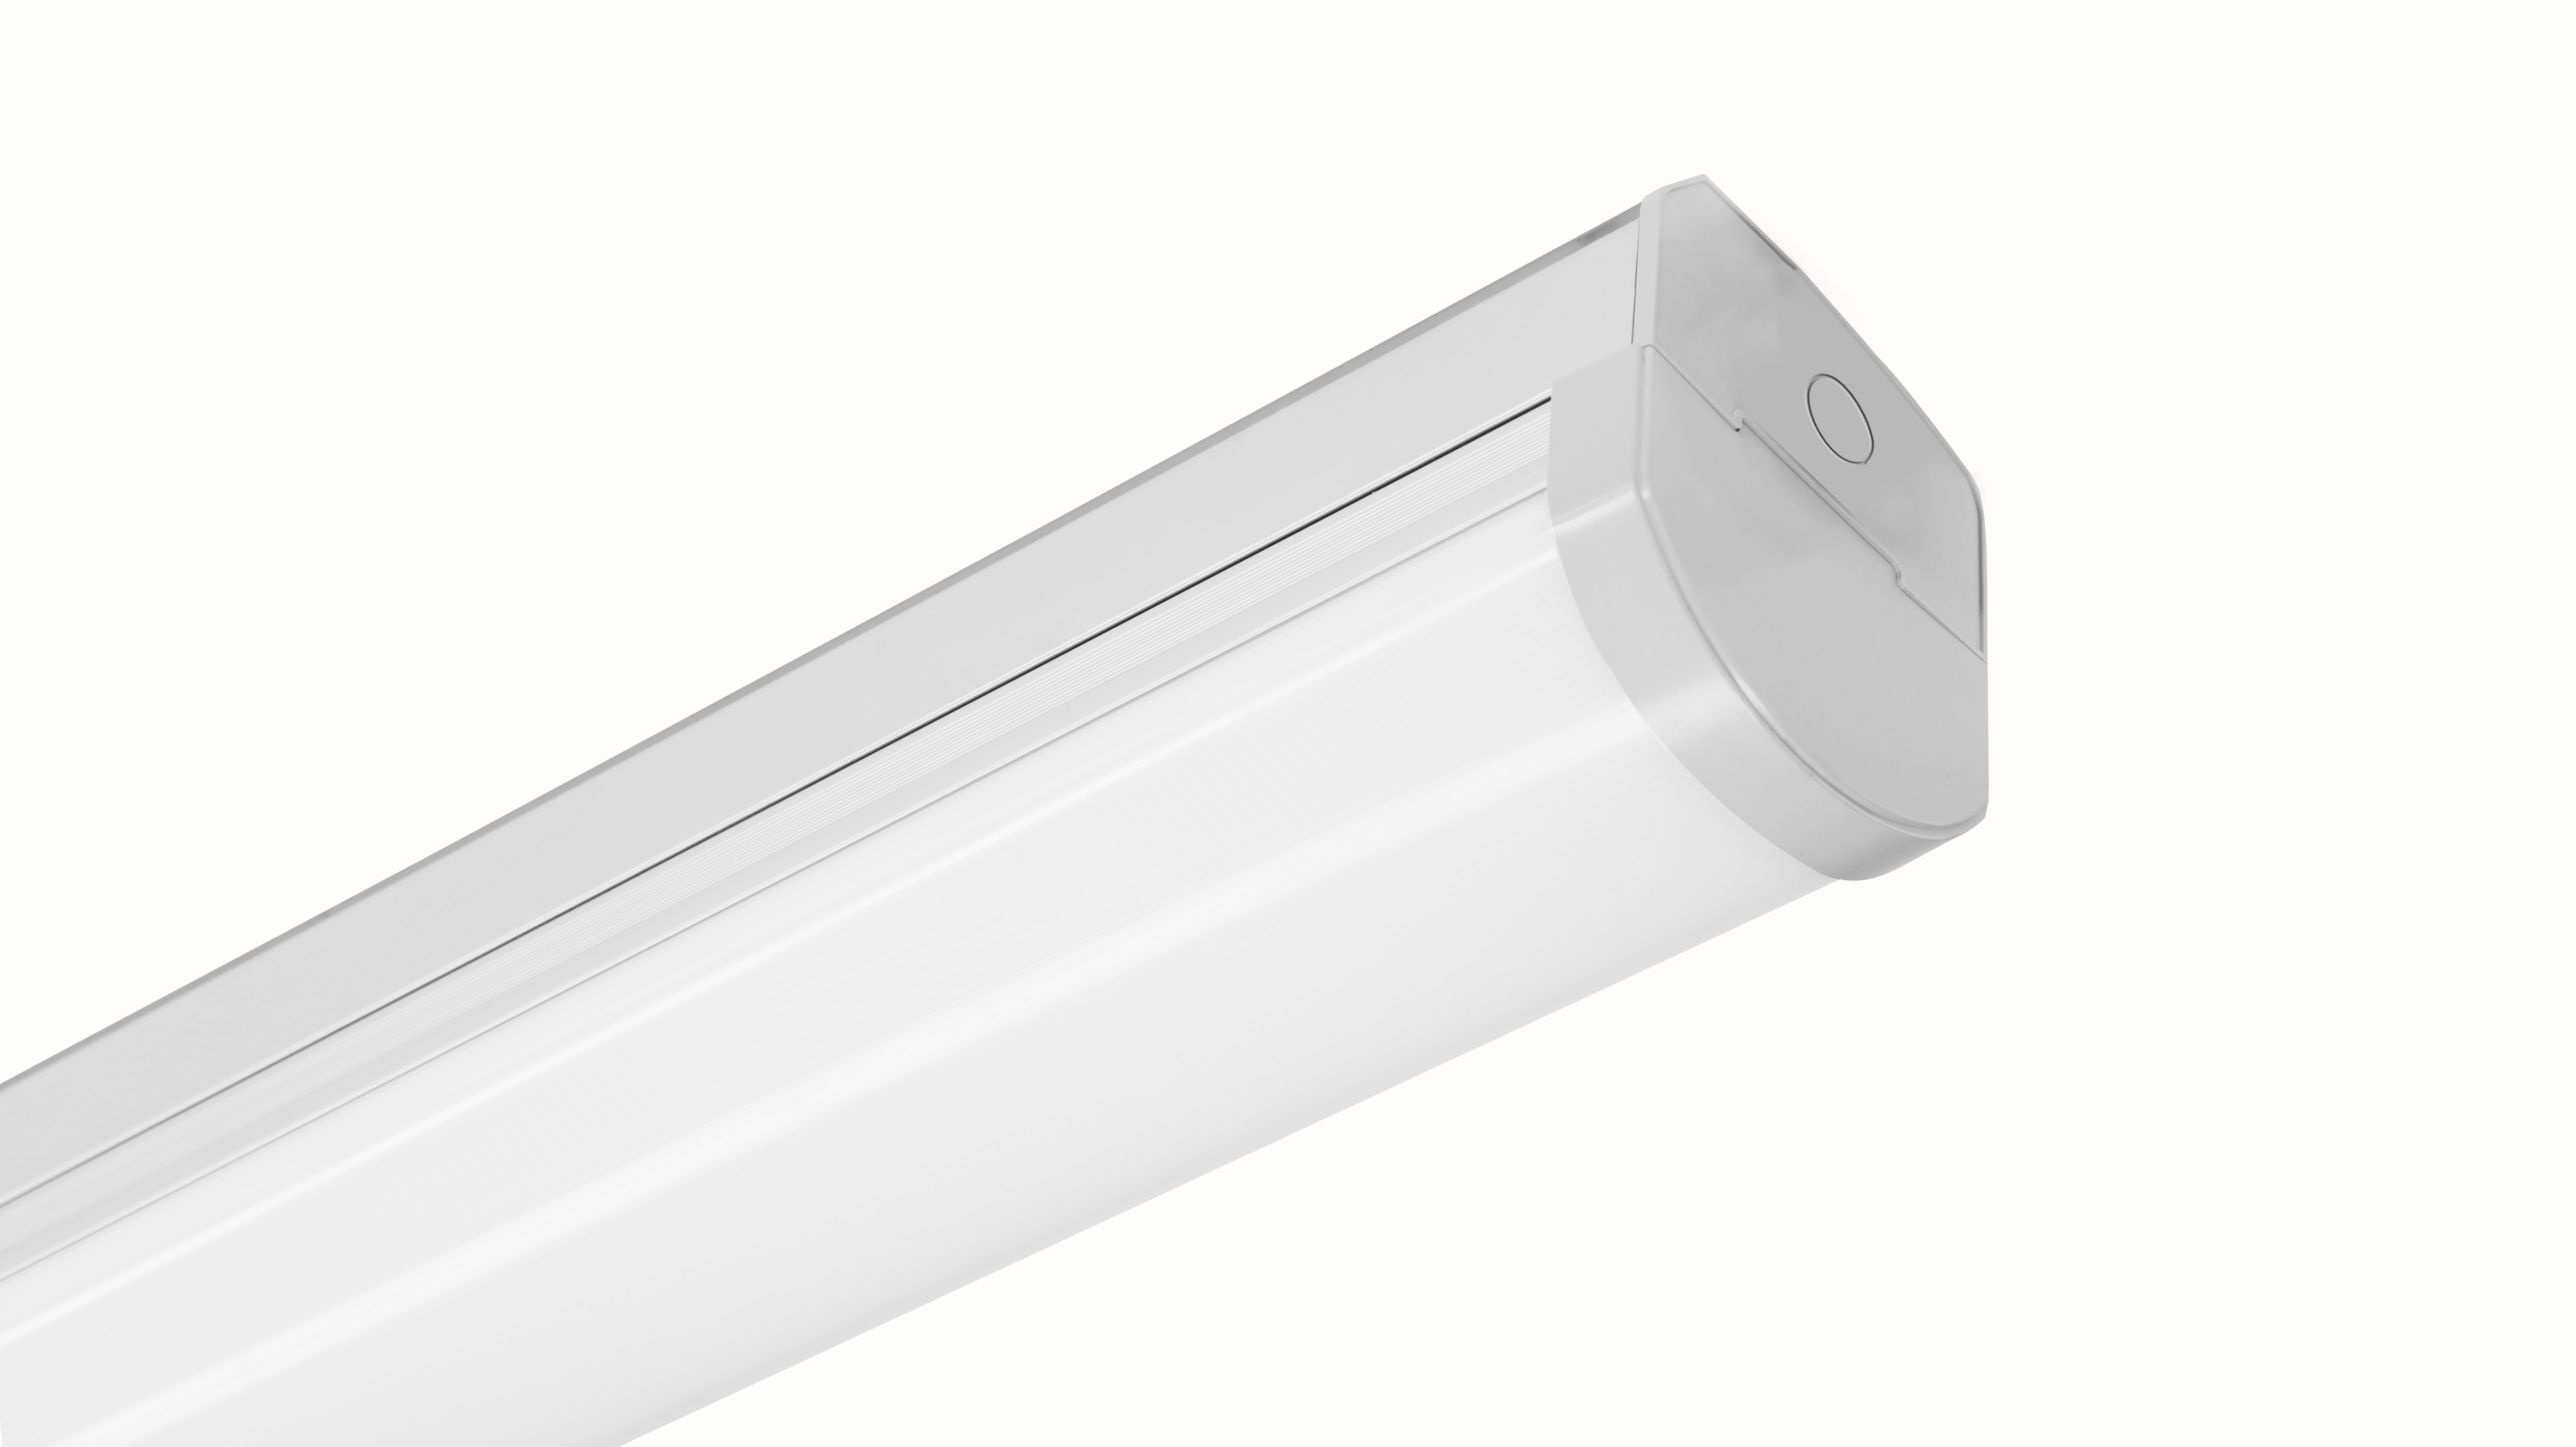 Solray Select LED Batten 4ft 20-34W Self-Test Emergency